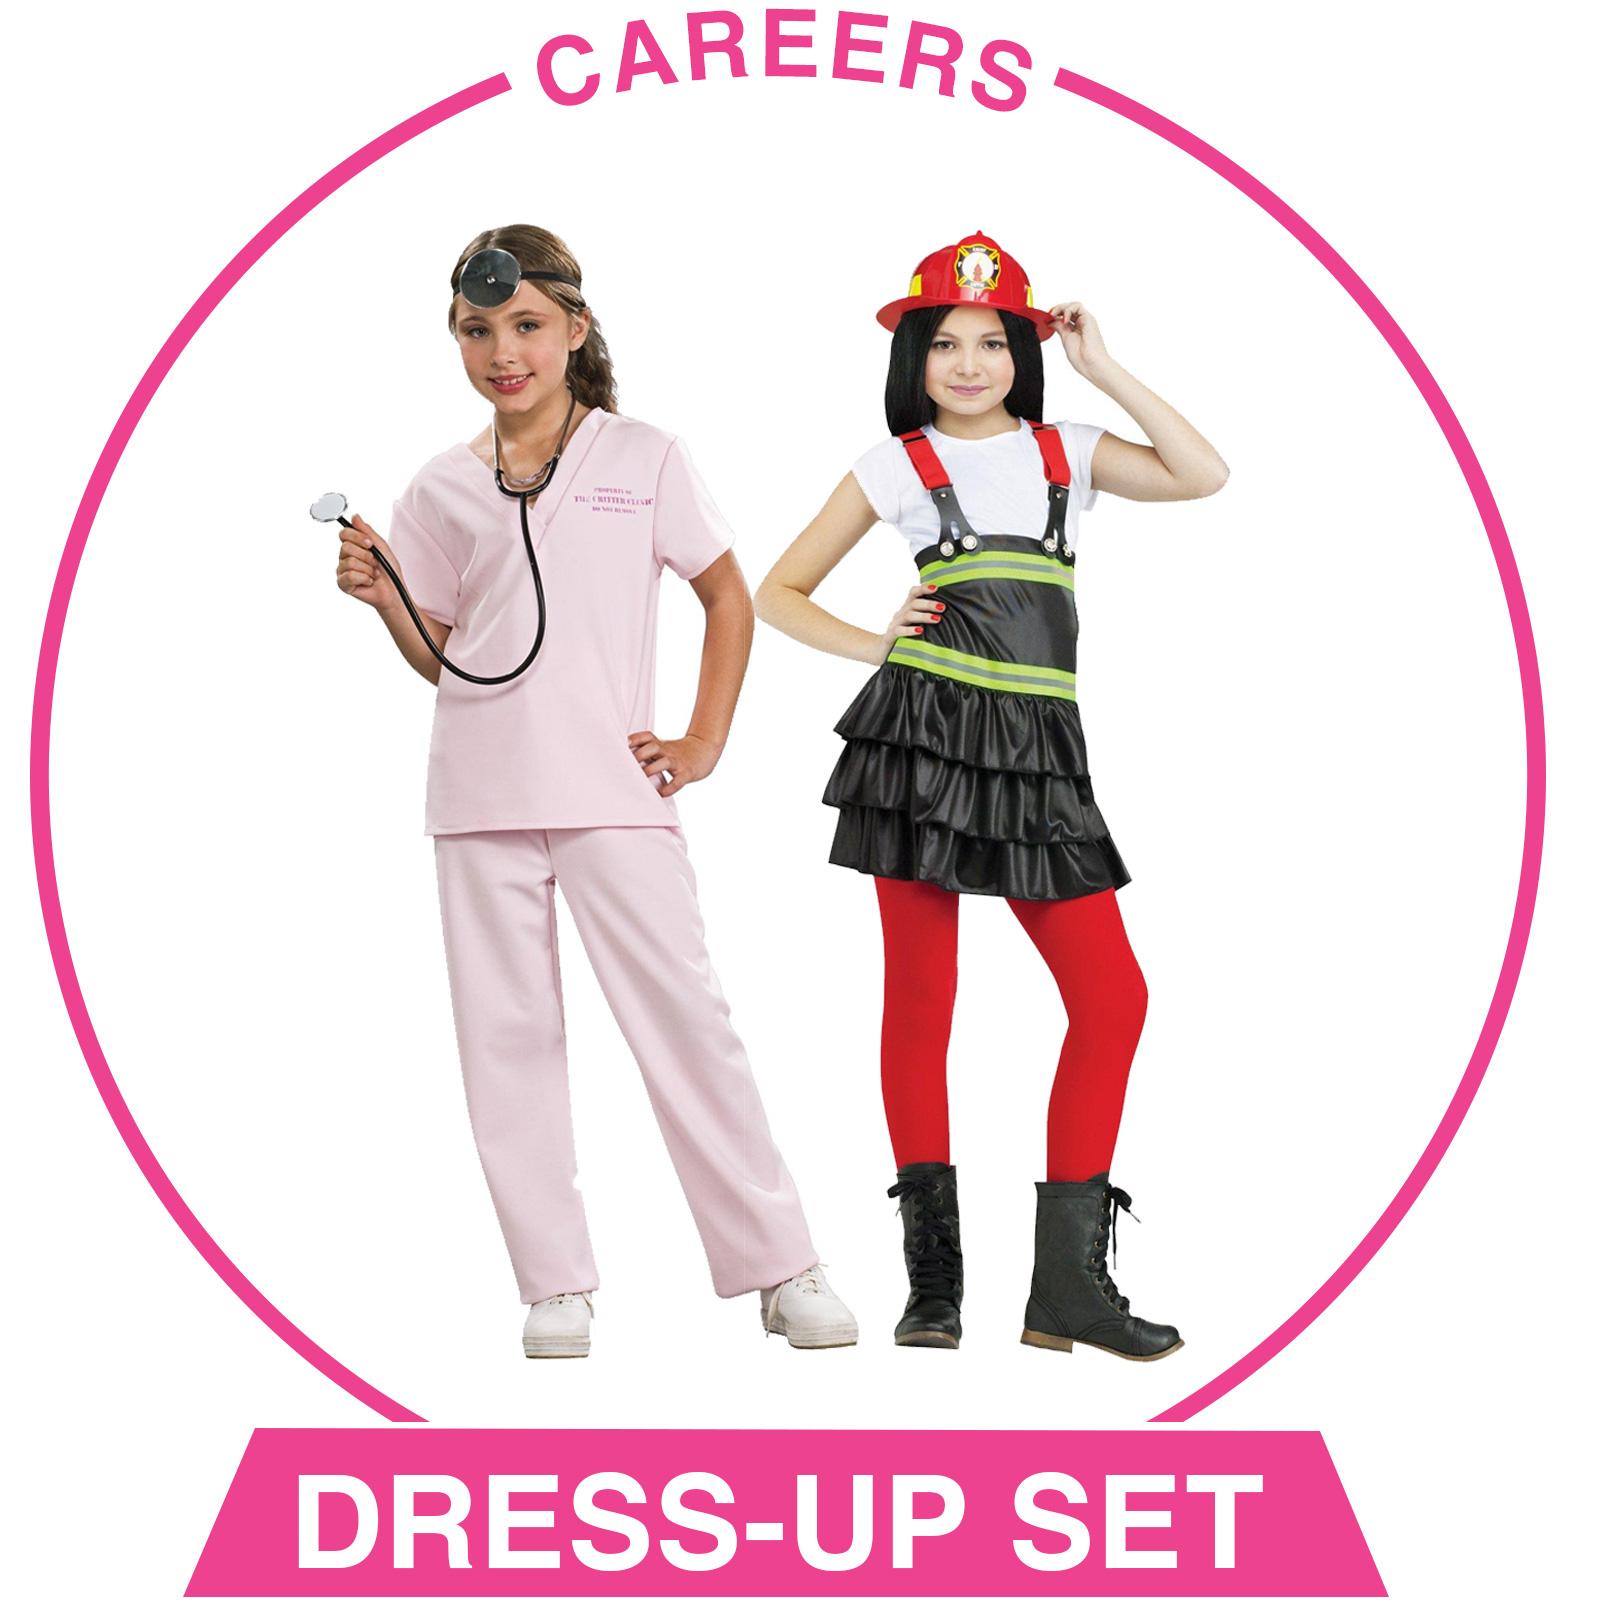 Careers Dress-Up Set - Girls